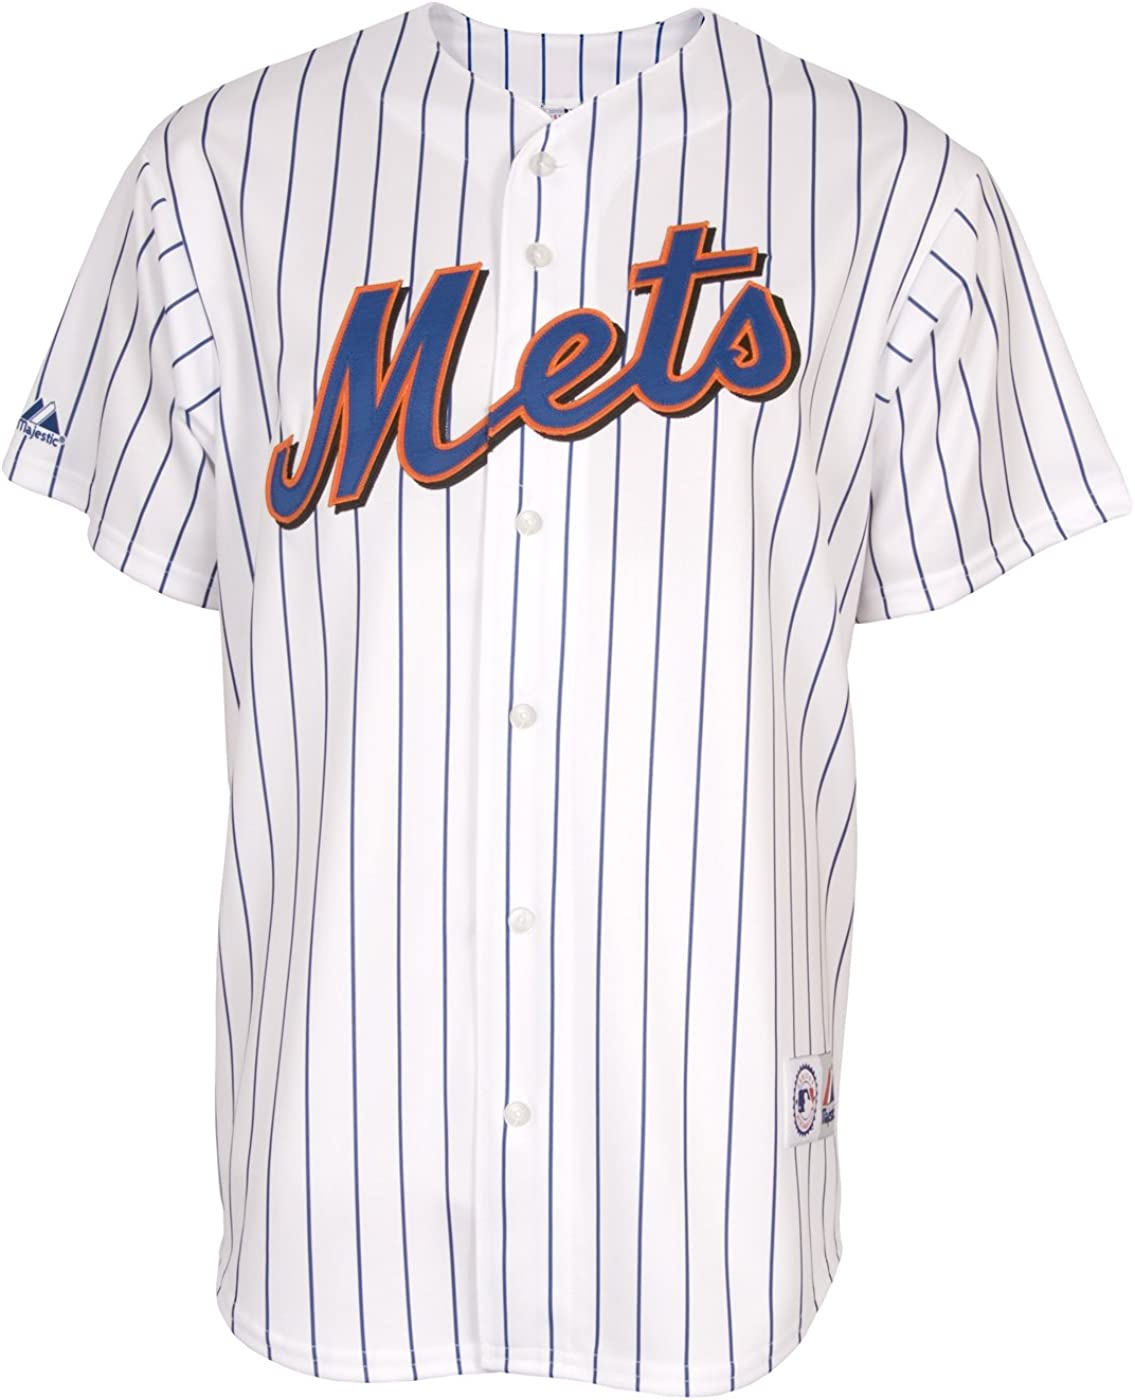 Jose Reyes New York Mets Replica Home Jersey ... - Amazon.com